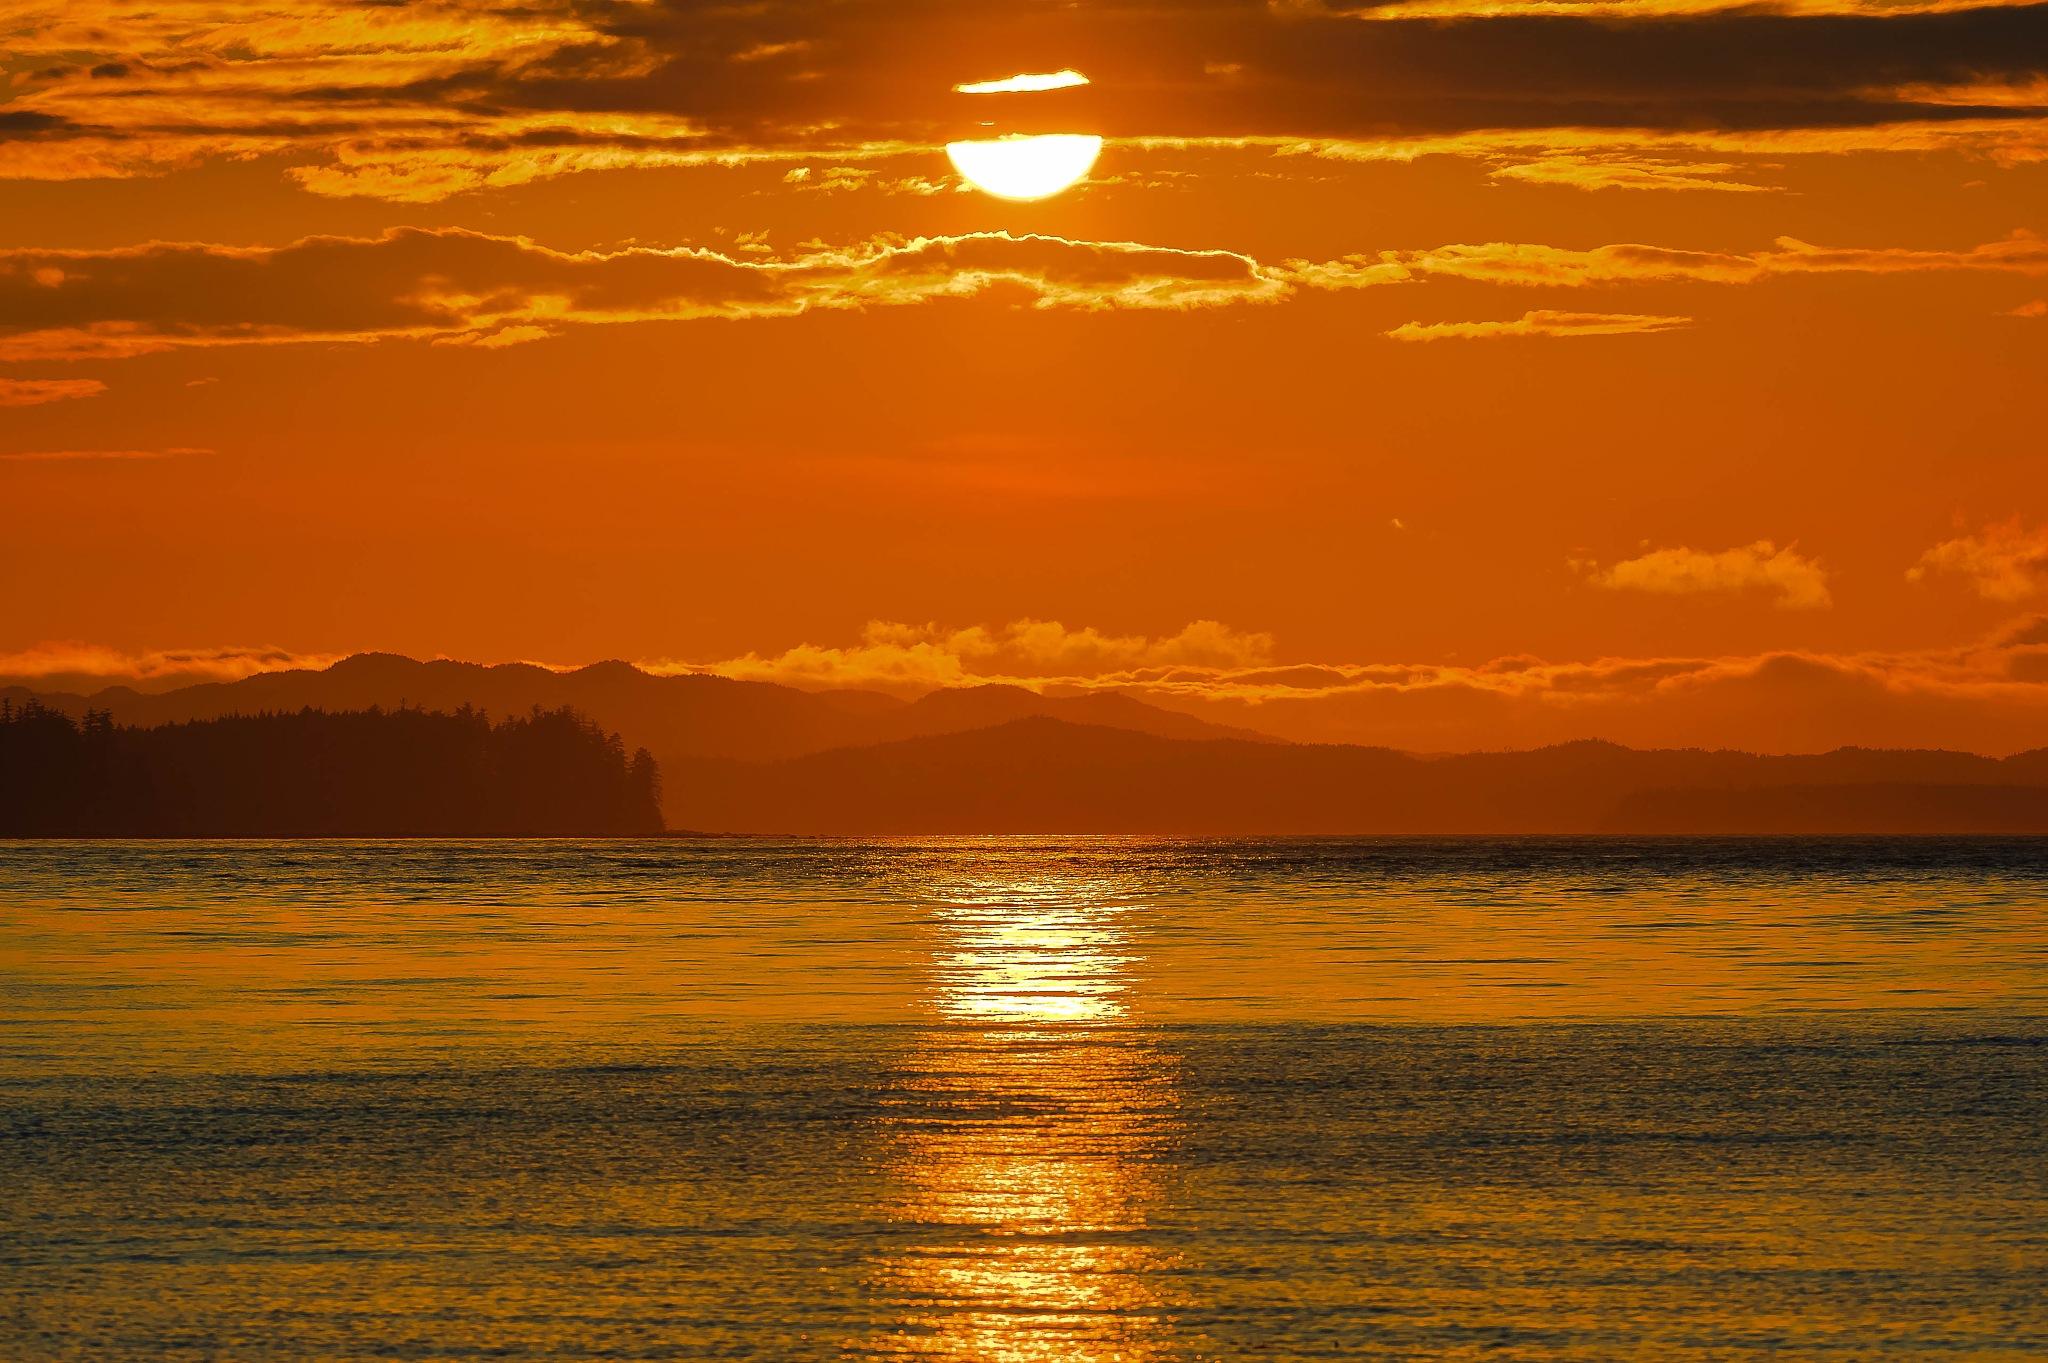 sunset  by jkirkphotography.com